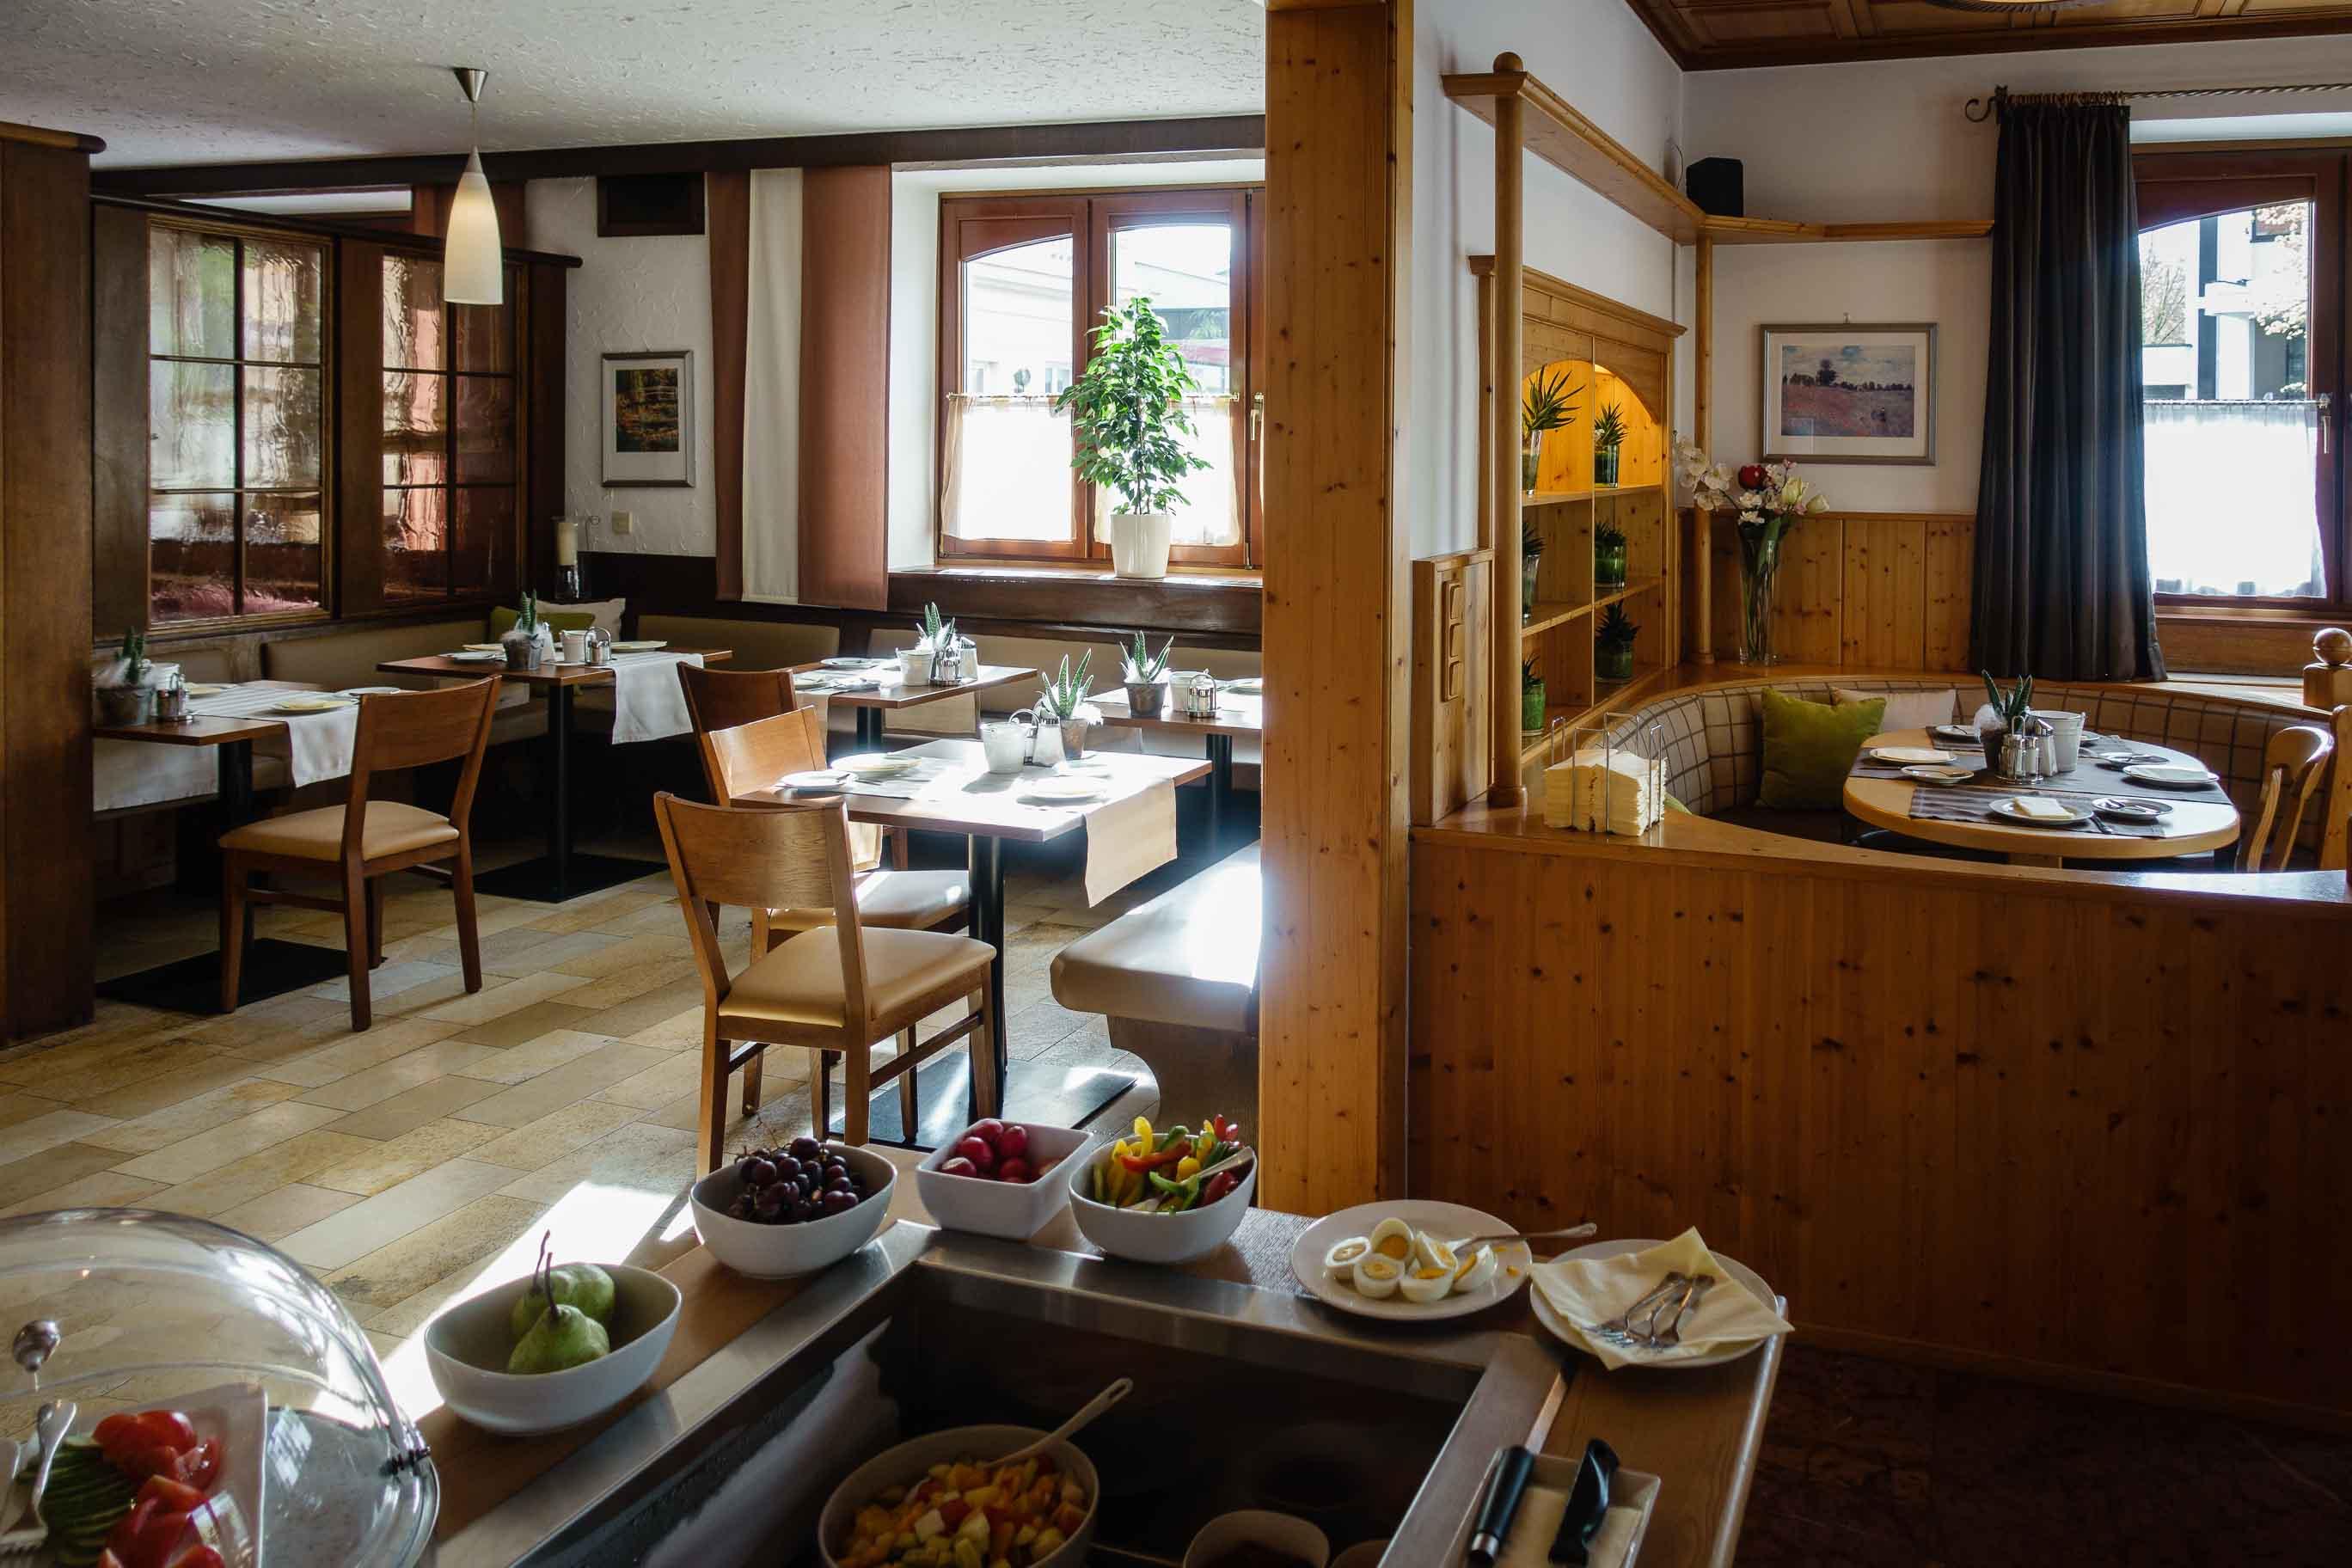 Hotel Almtalerhof Fruehstueck 0590